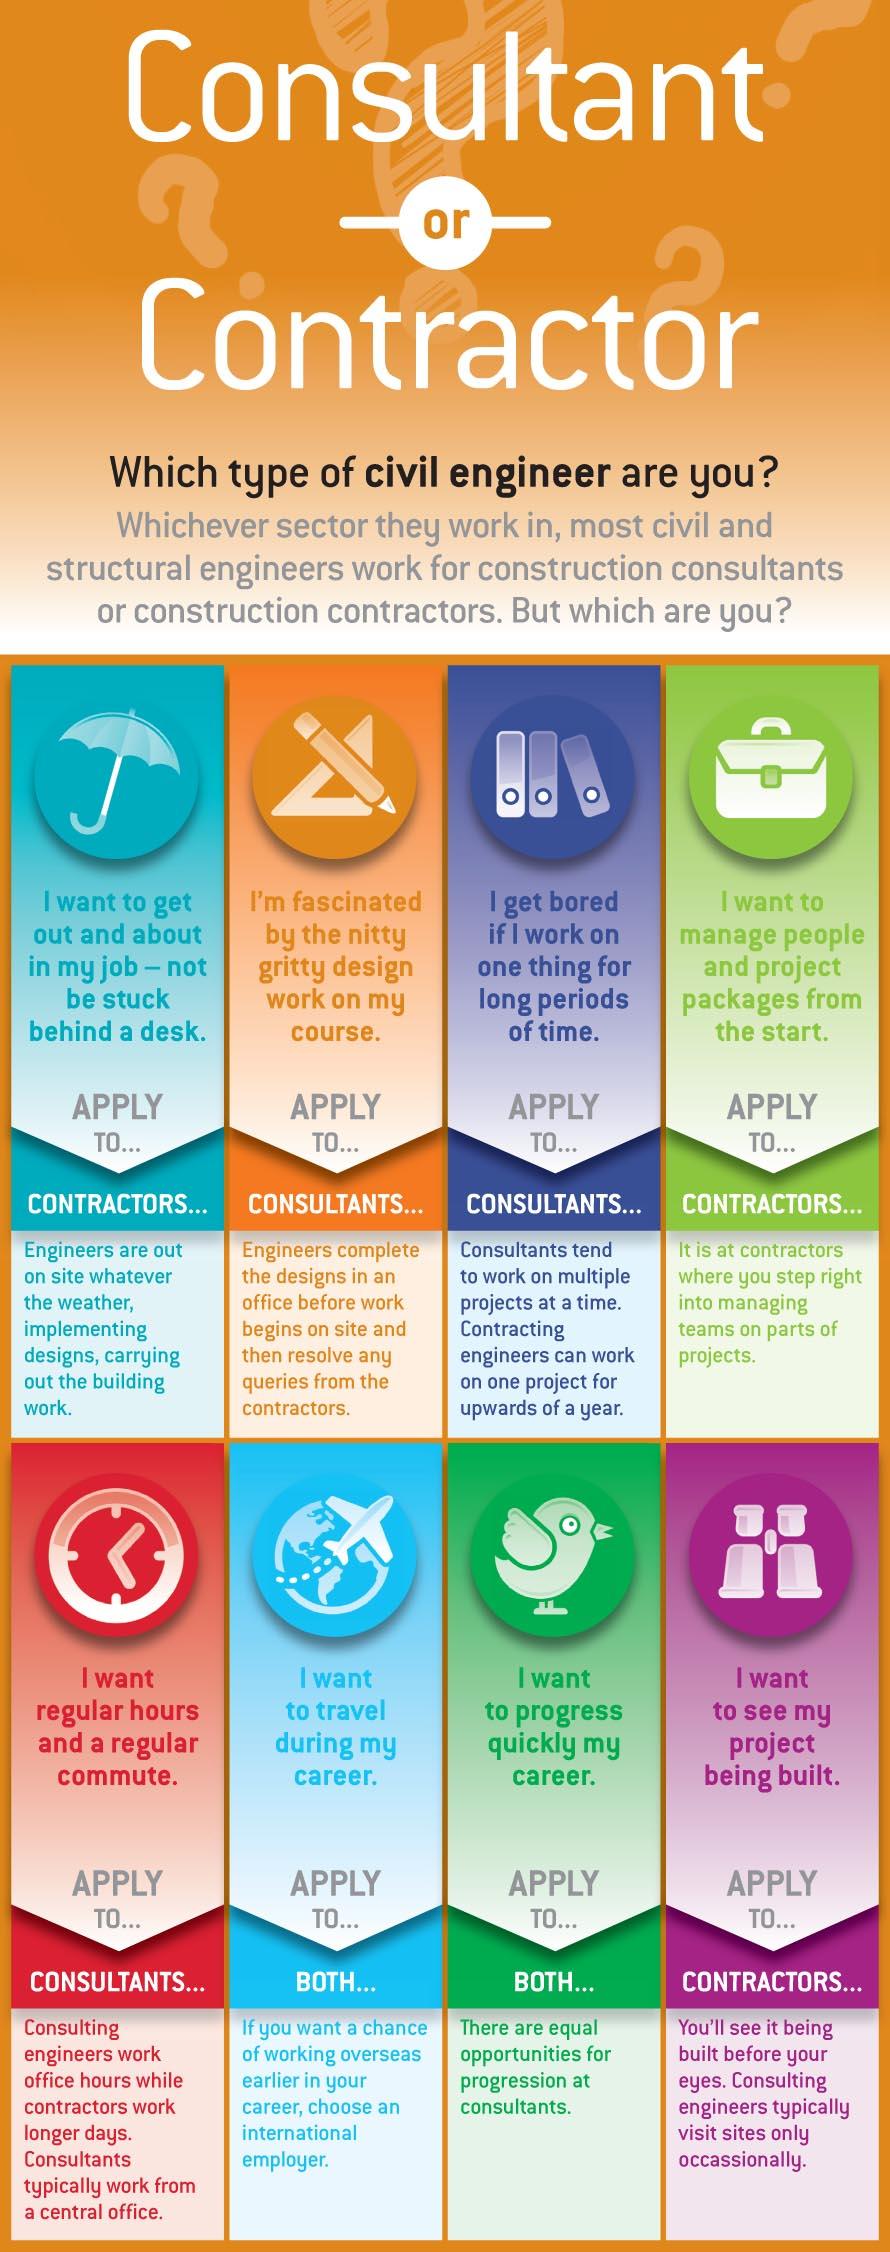 Choosing the best civil engineering employer